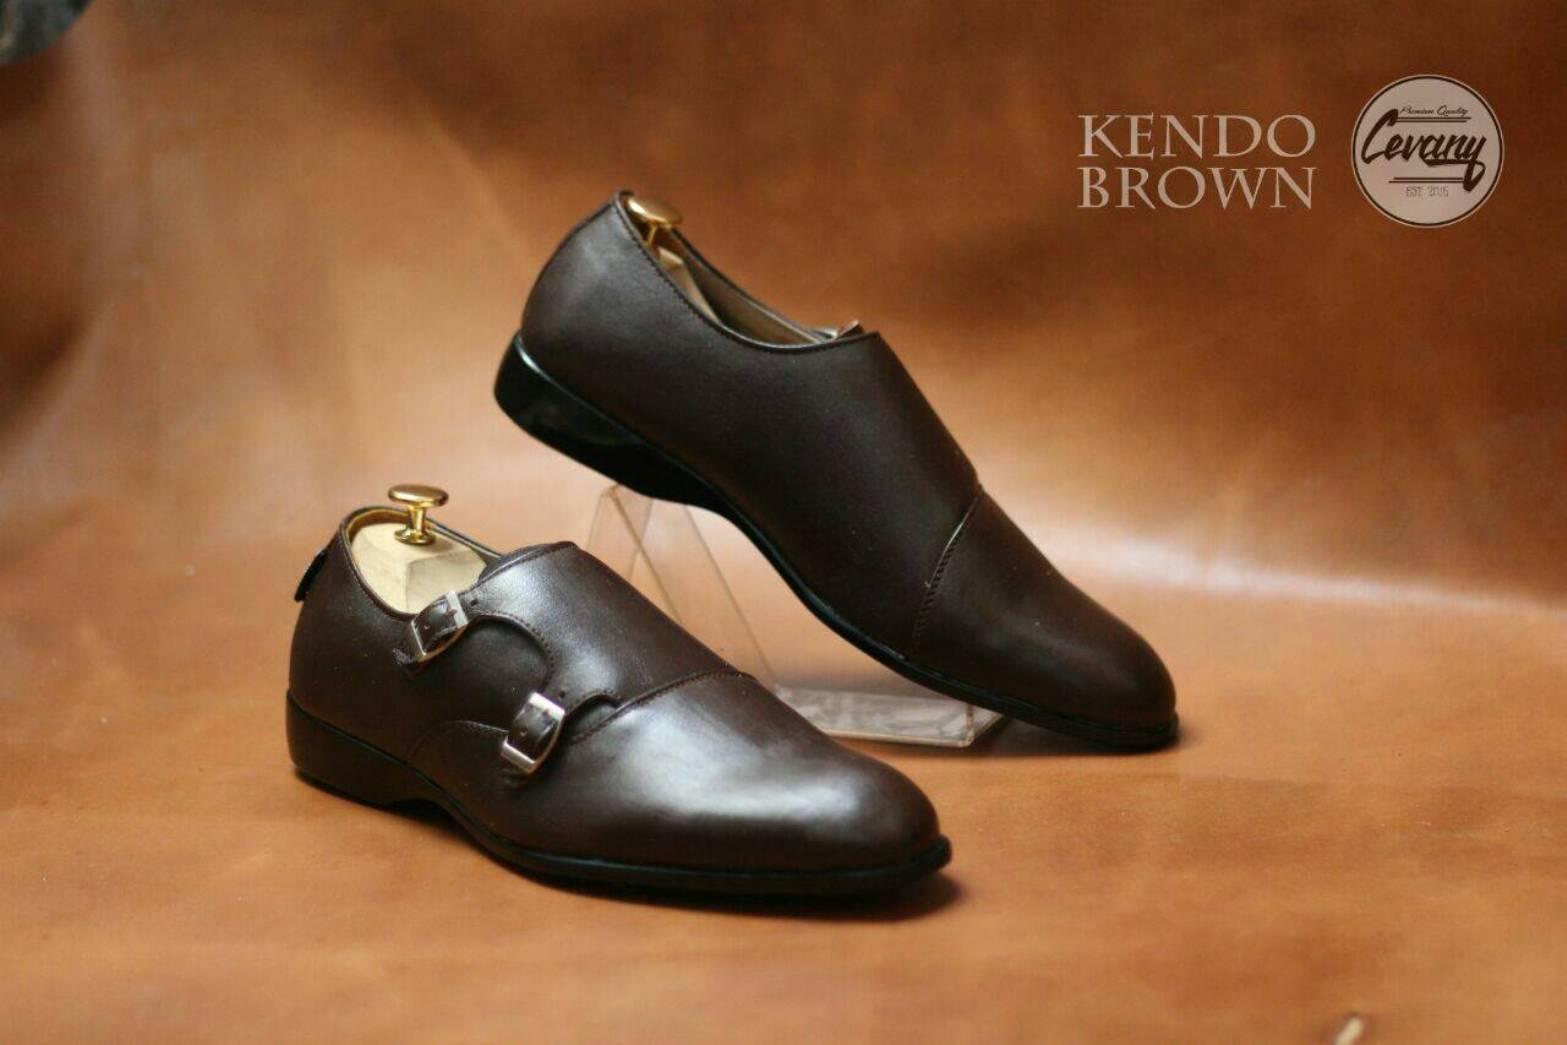 Kelebihan Sepatu Pantofel Pria Cevany Kulit Asli Original Terkini Cepc Cocoes Kerak Store Formal Hitam